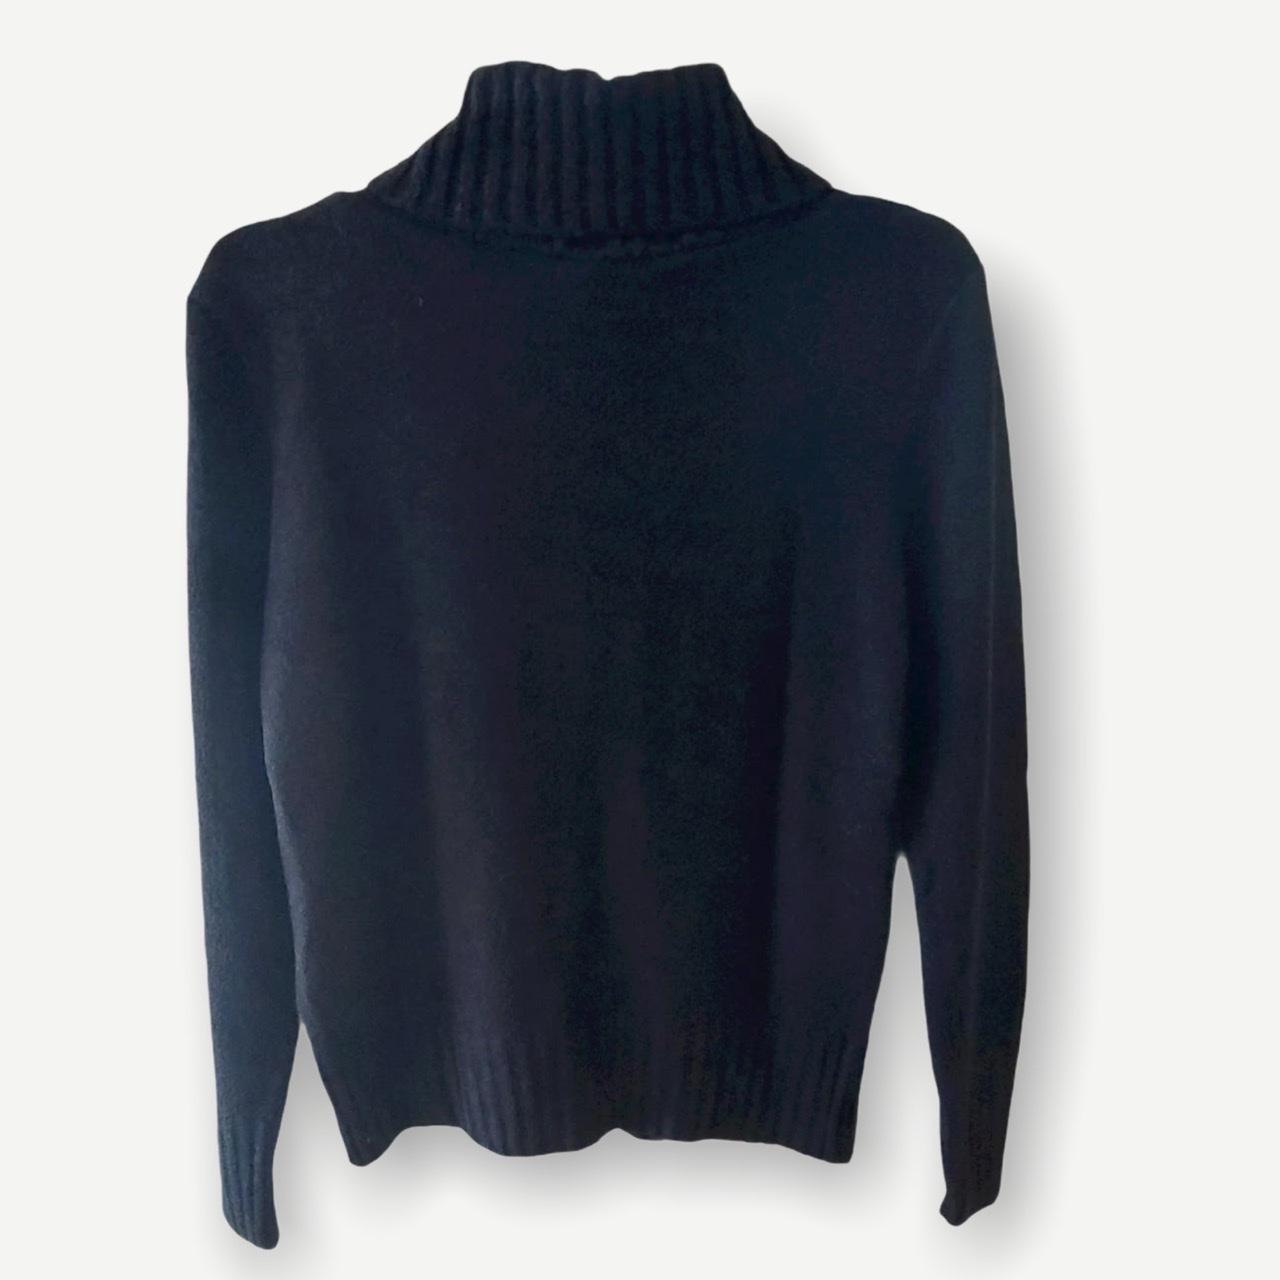 Blusa Rebeca preta tricot   - Vivian Bógus